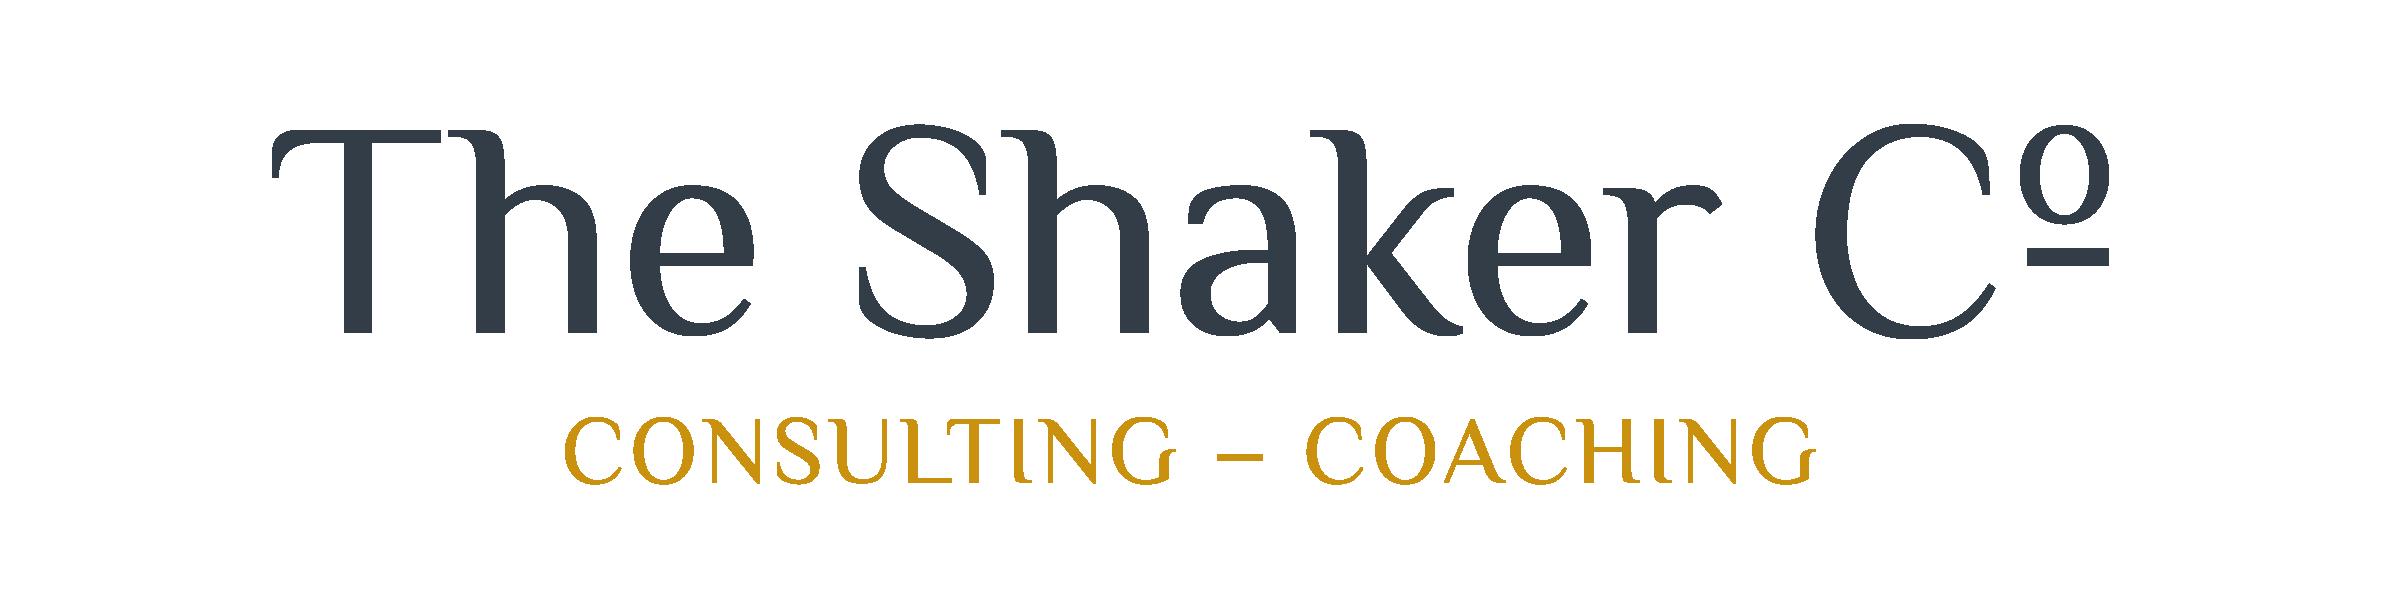 logo de The Shaker Company